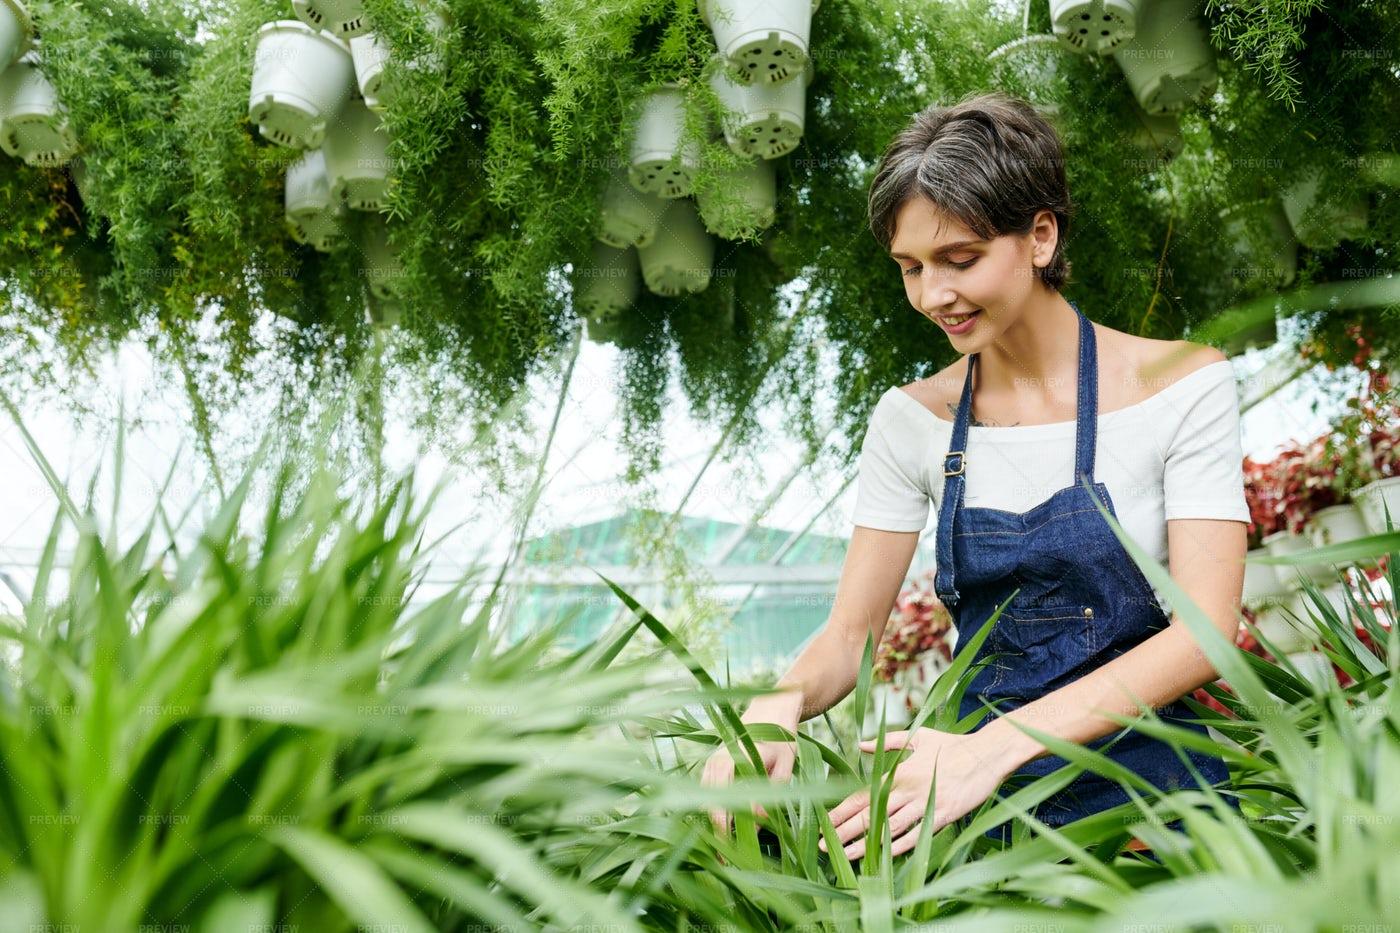 Woman Enjoying Working With Plants: Stock Photos